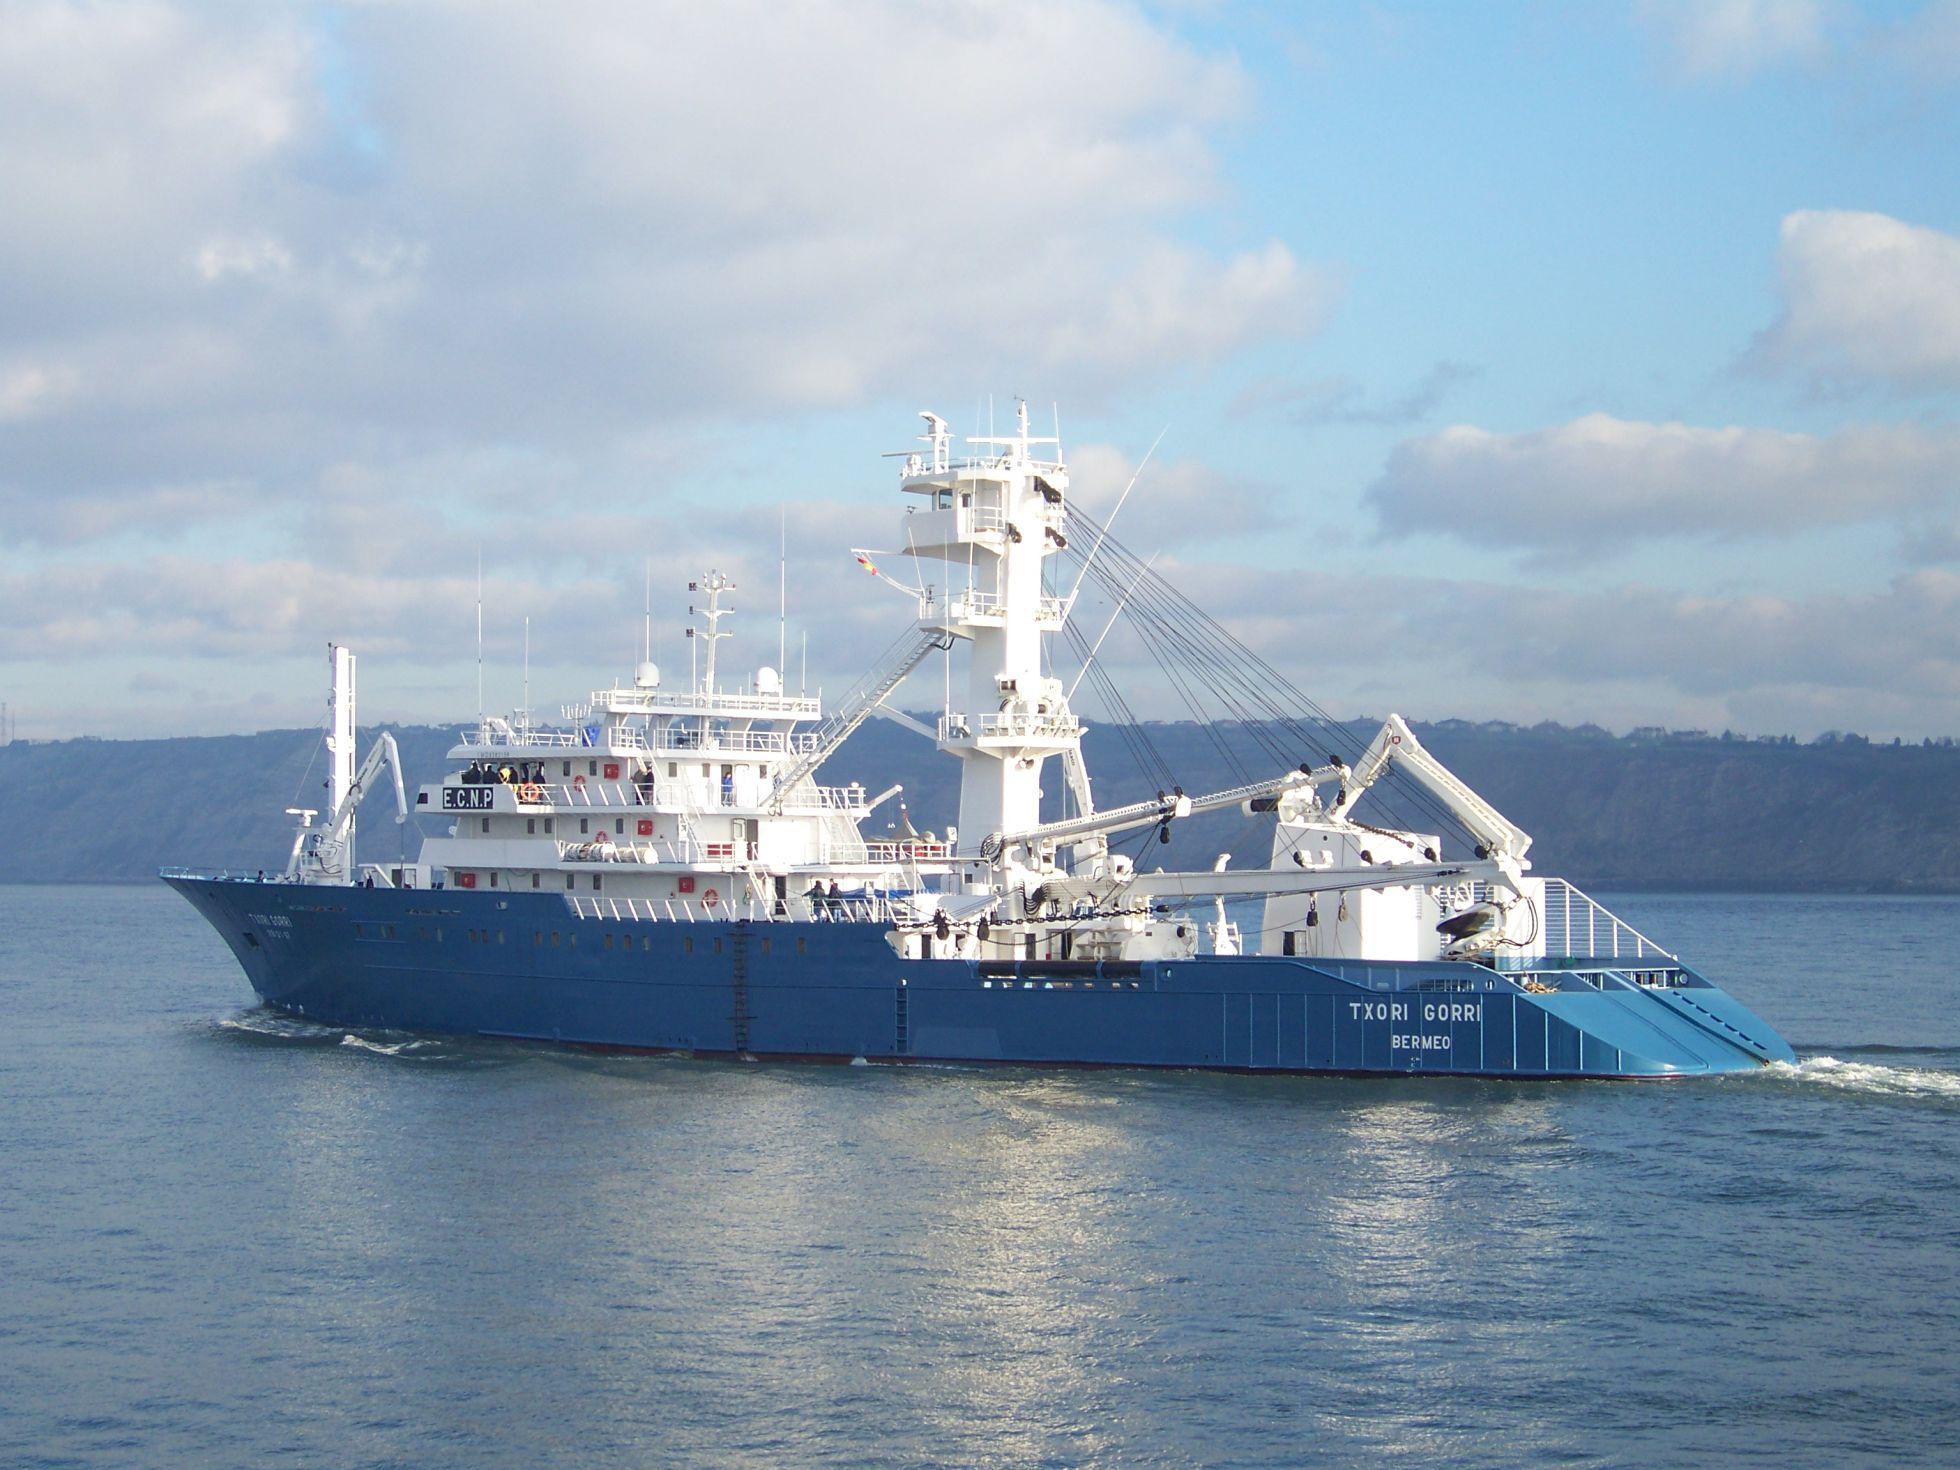 Basque Tuna Boat Txori Gorri - Photo: El Pais